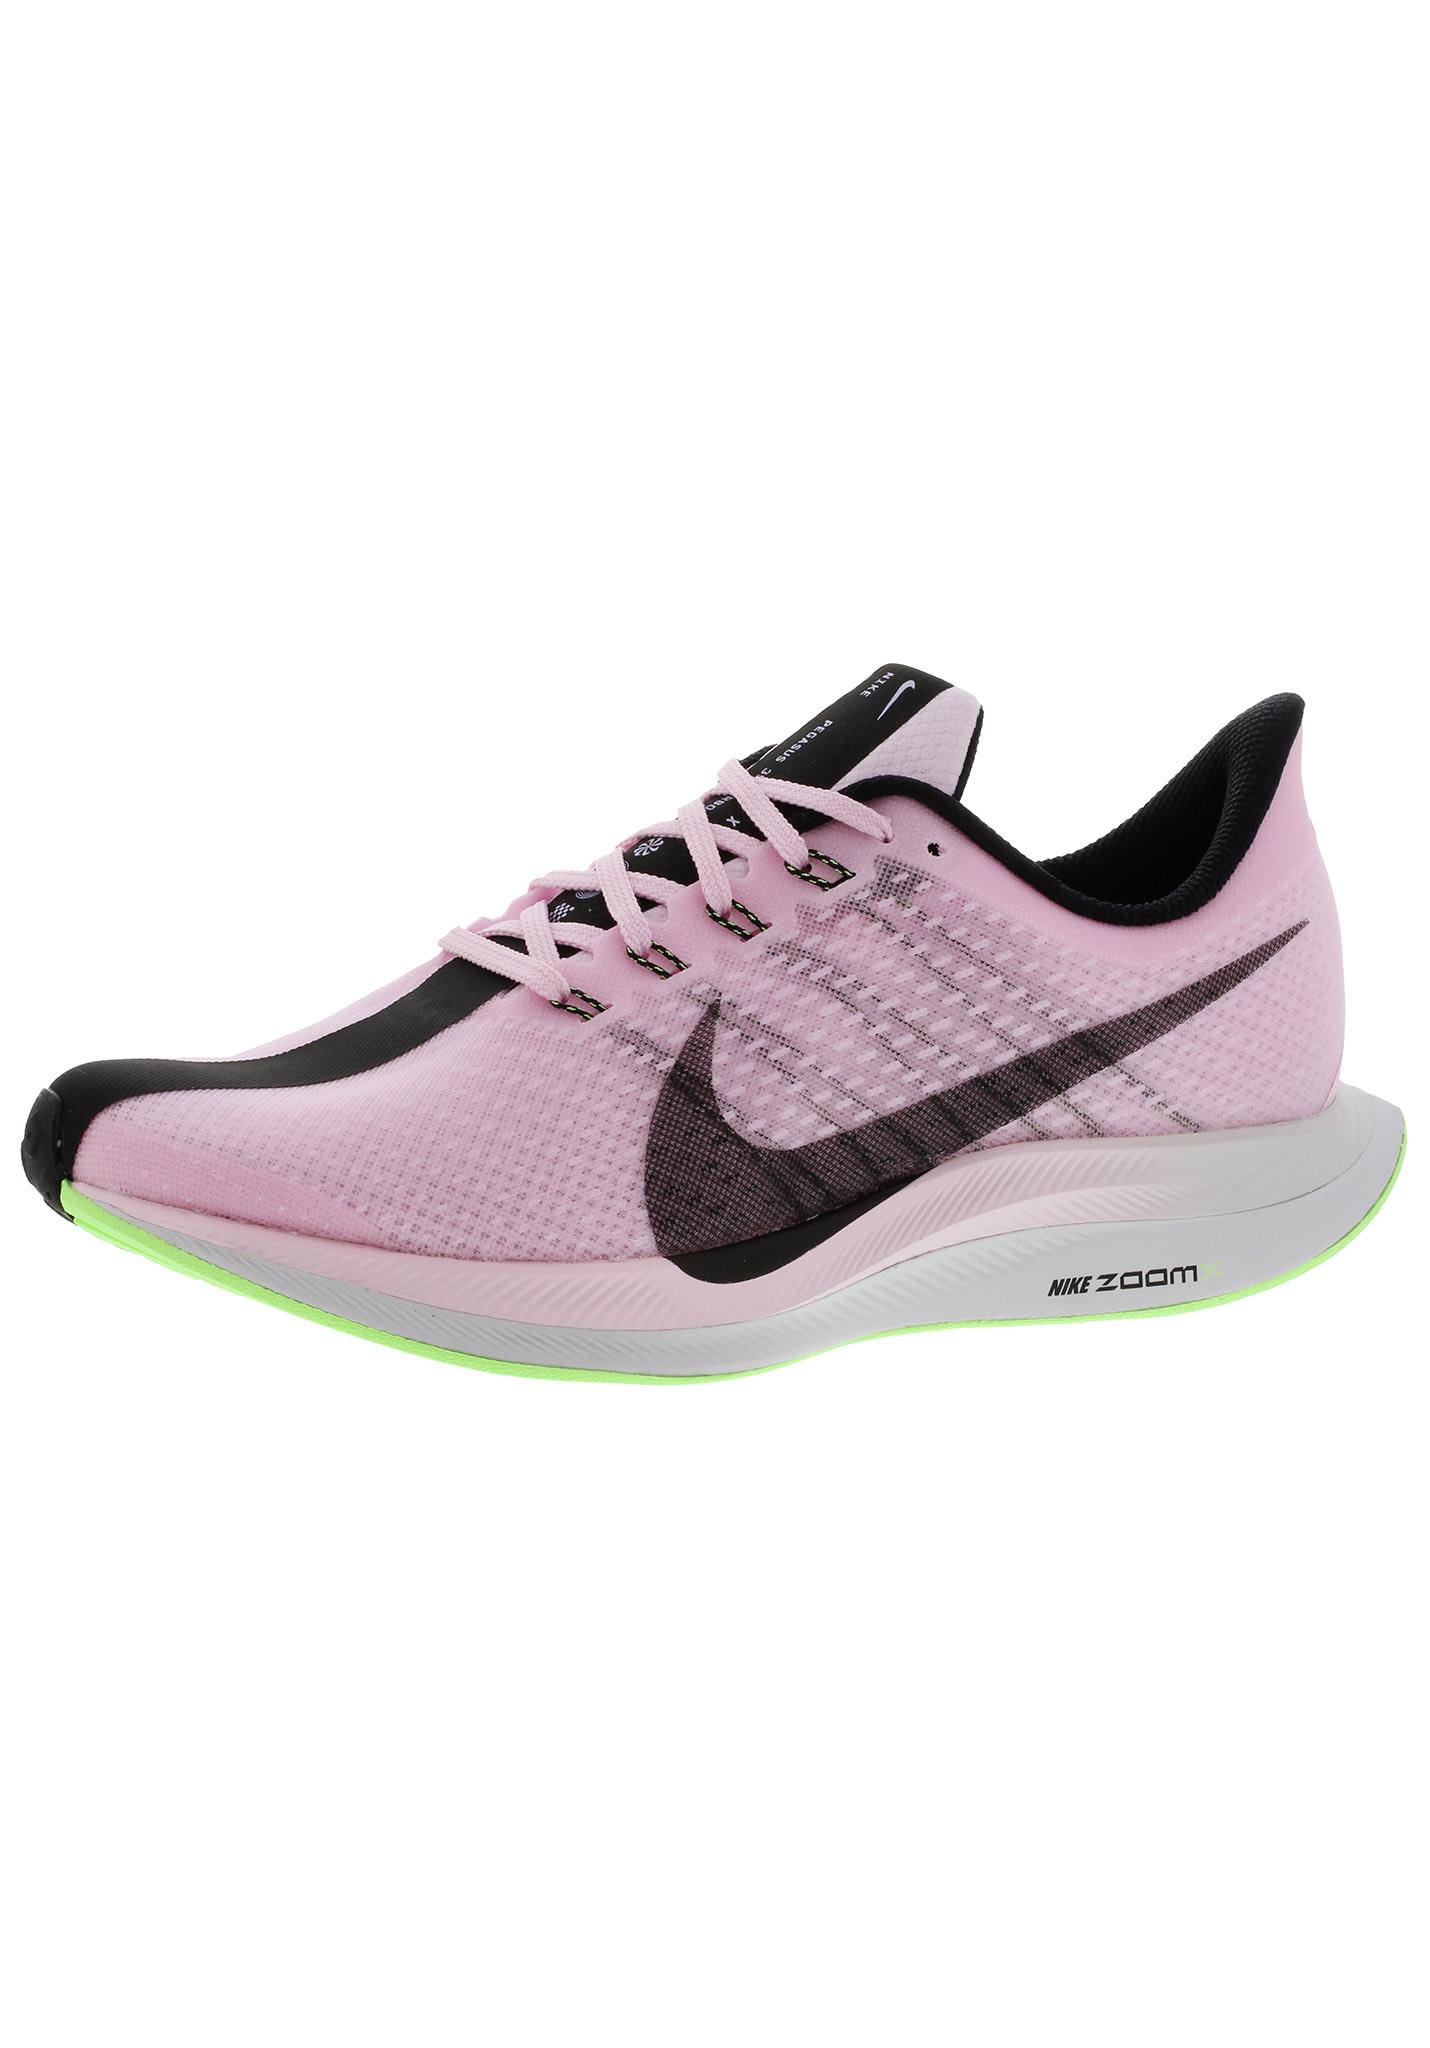 a4906b12530f4 Nike Zoom Pegasus Turbo - Running shoes for Women - Pink